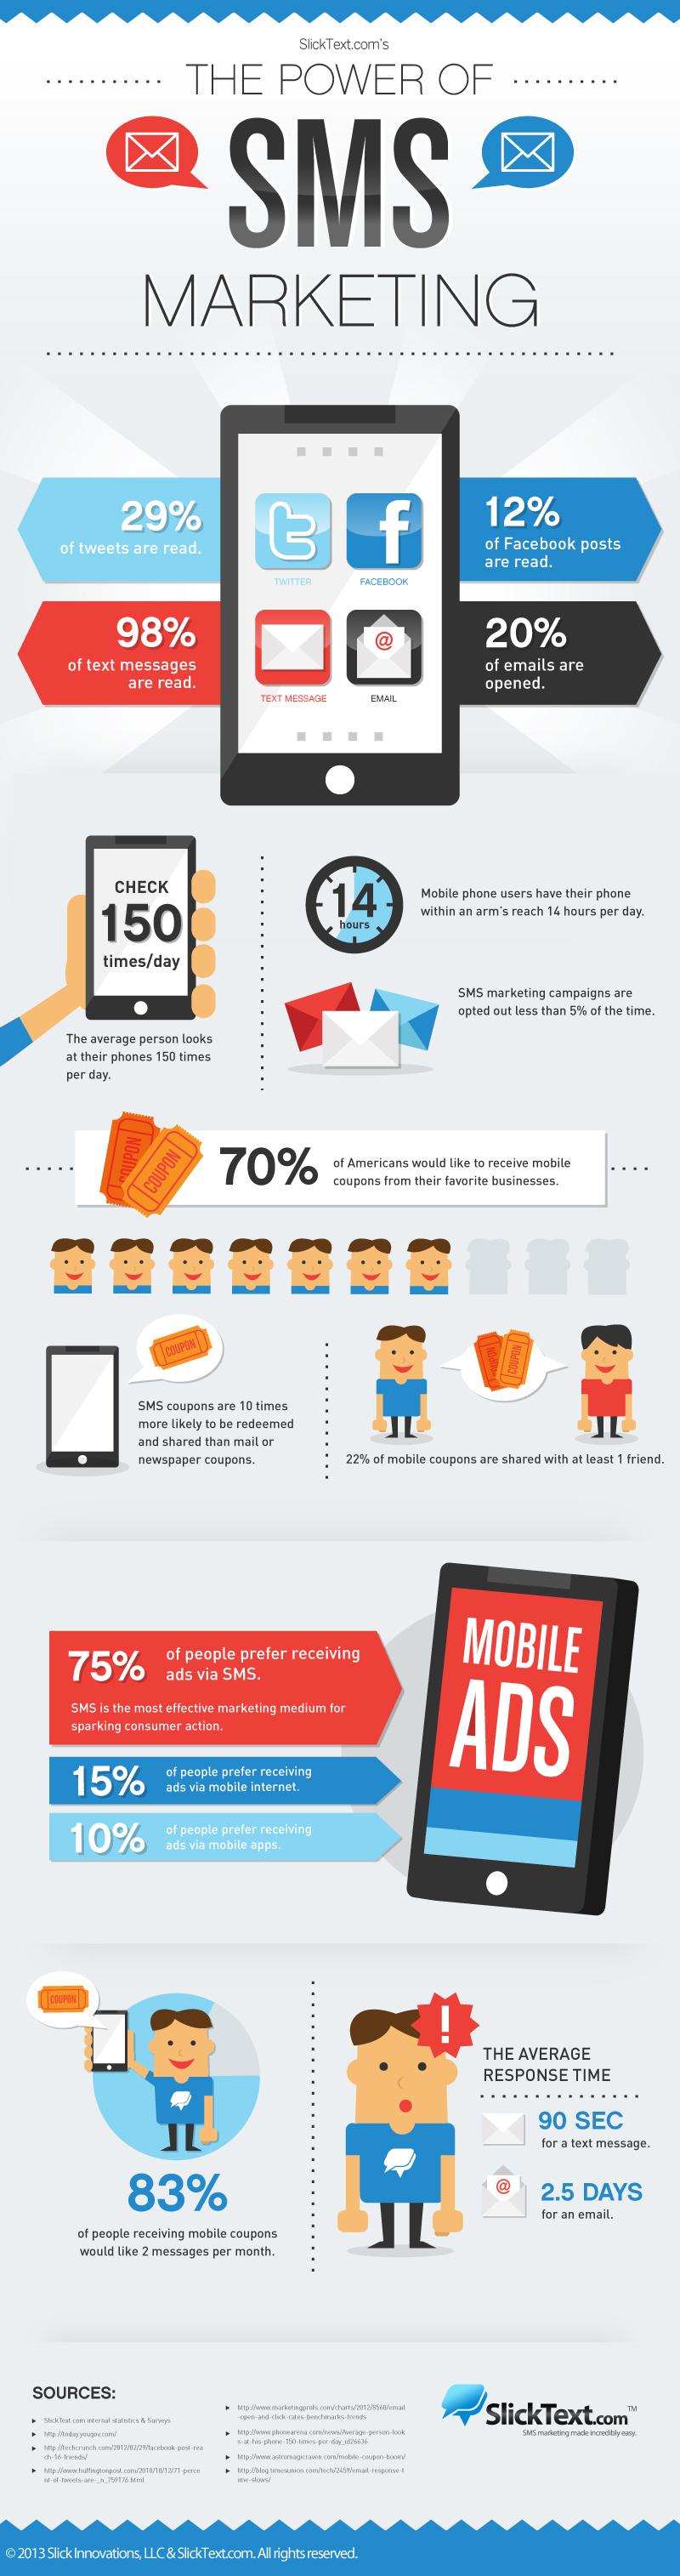 El poder del SMS marketing